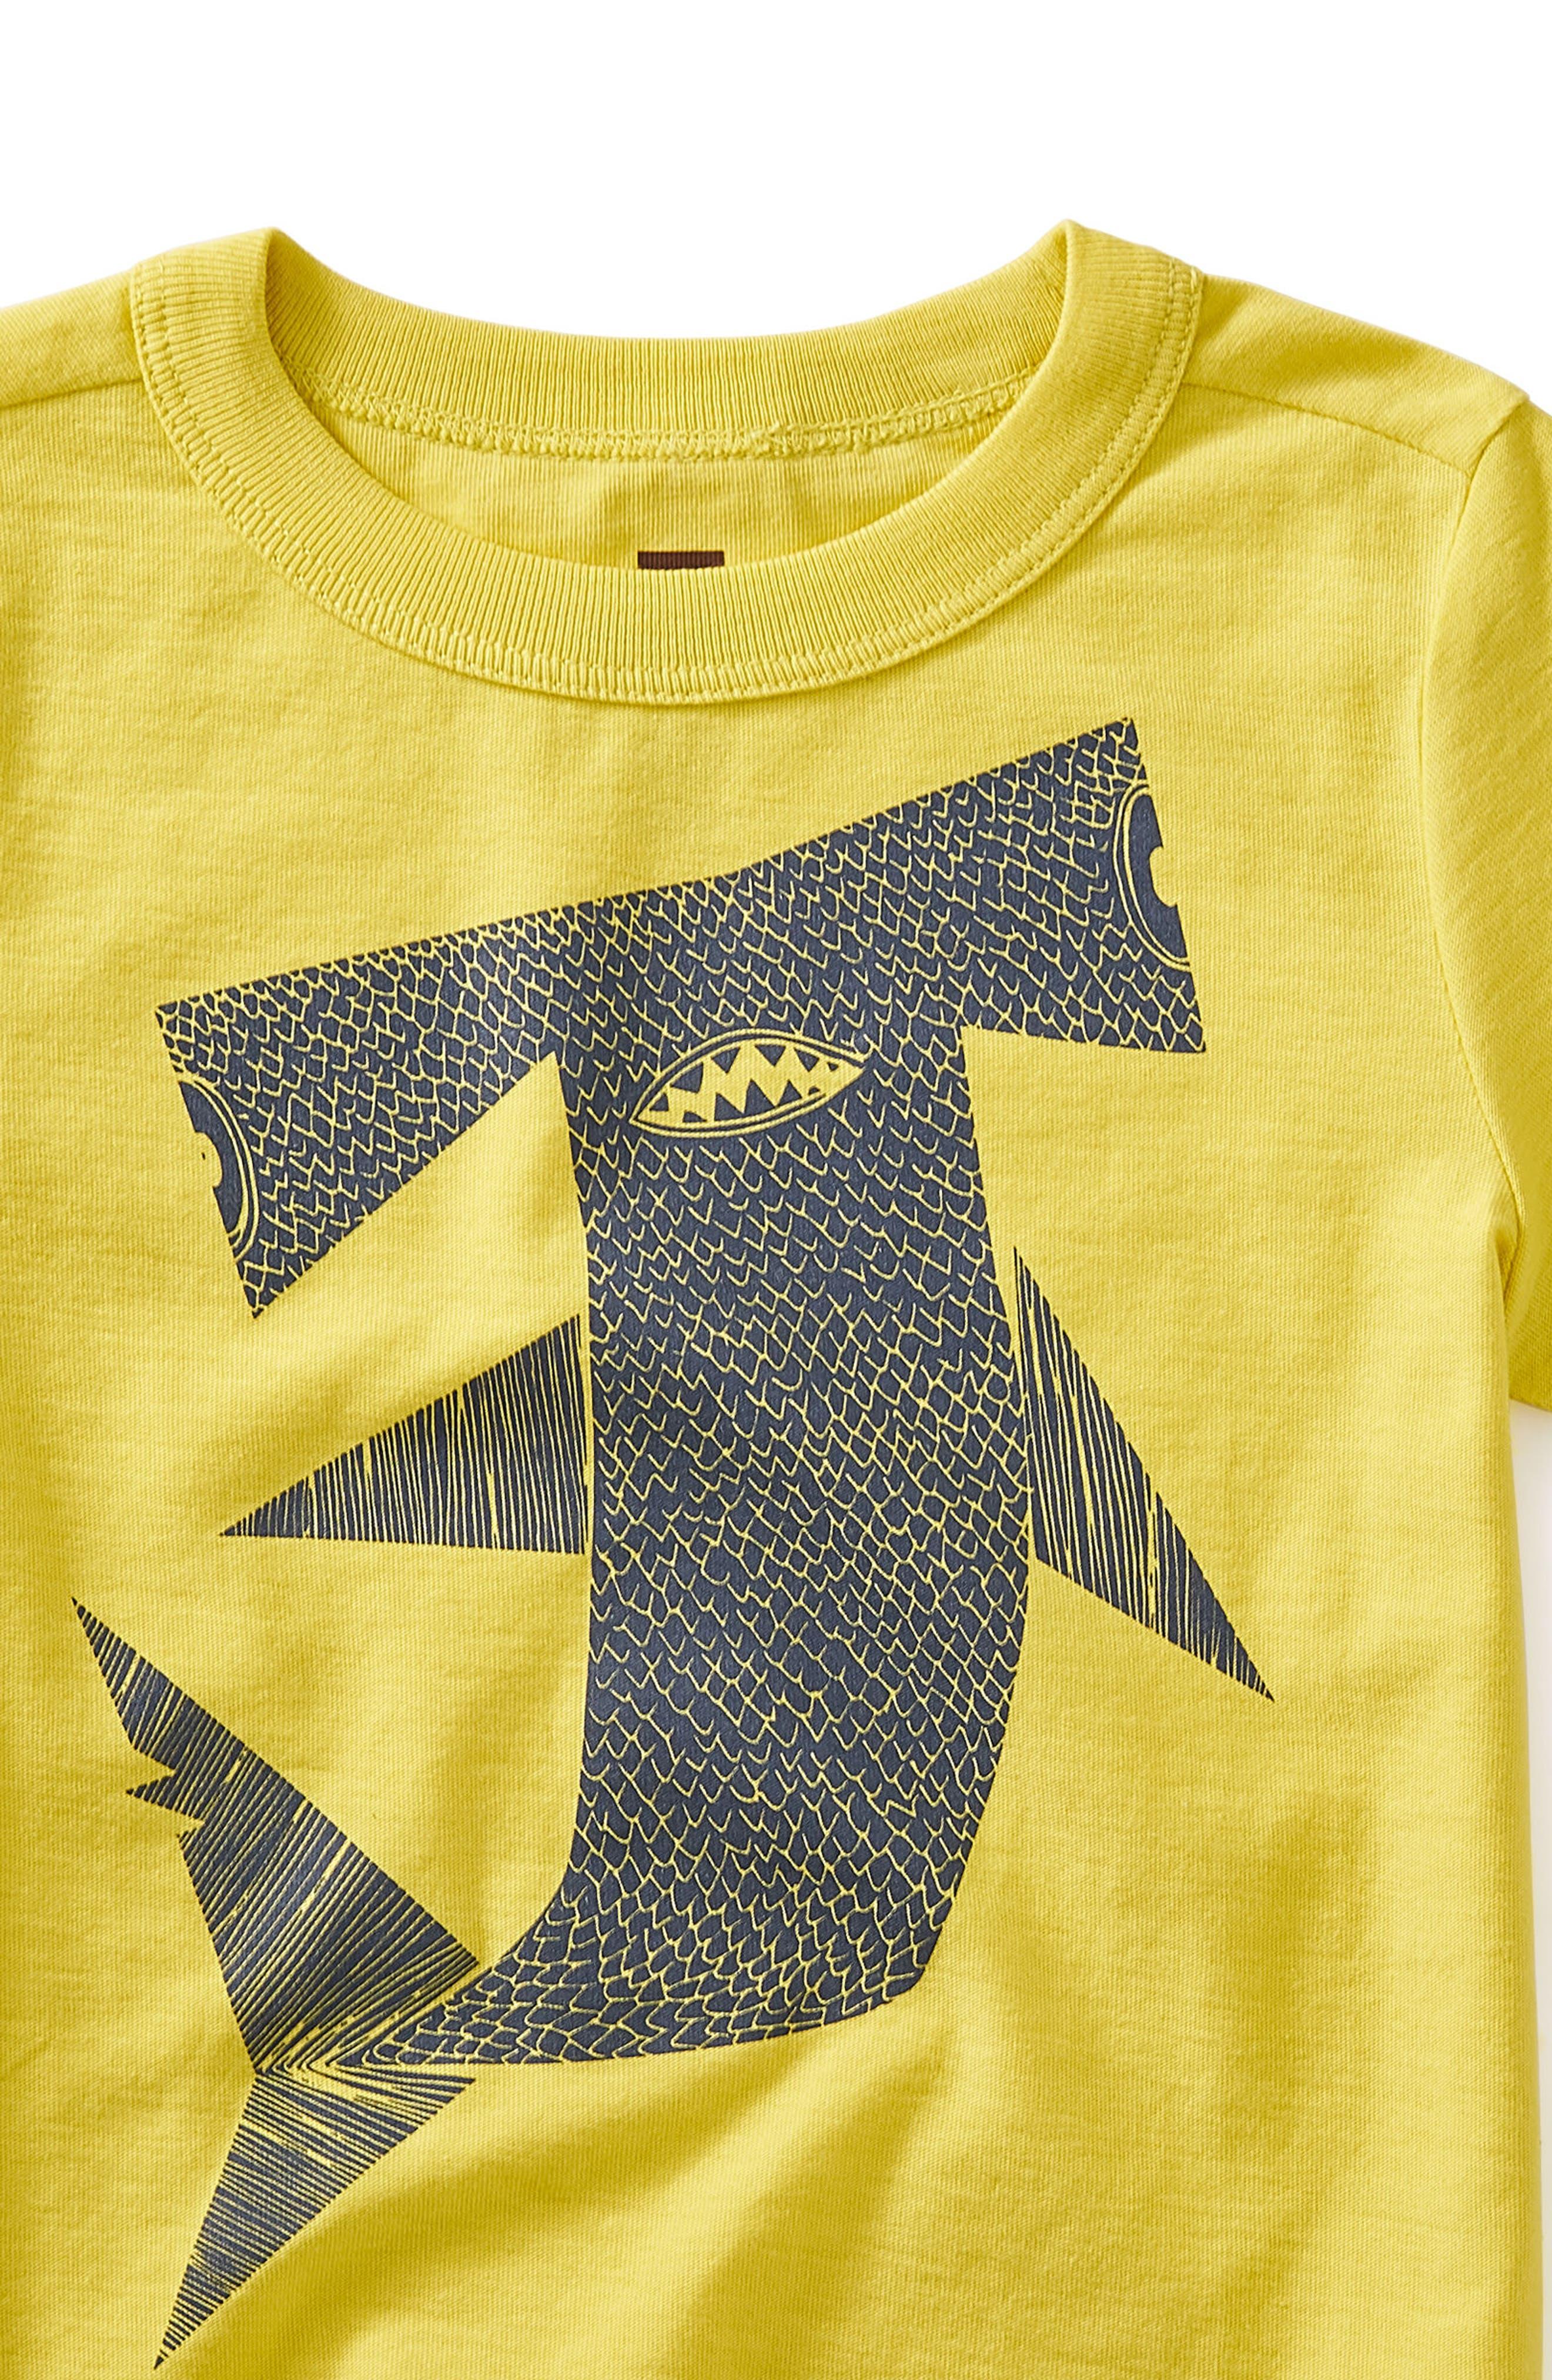 Hammer Time T-Shirt,                             Alternate thumbnail 2, color,                             721